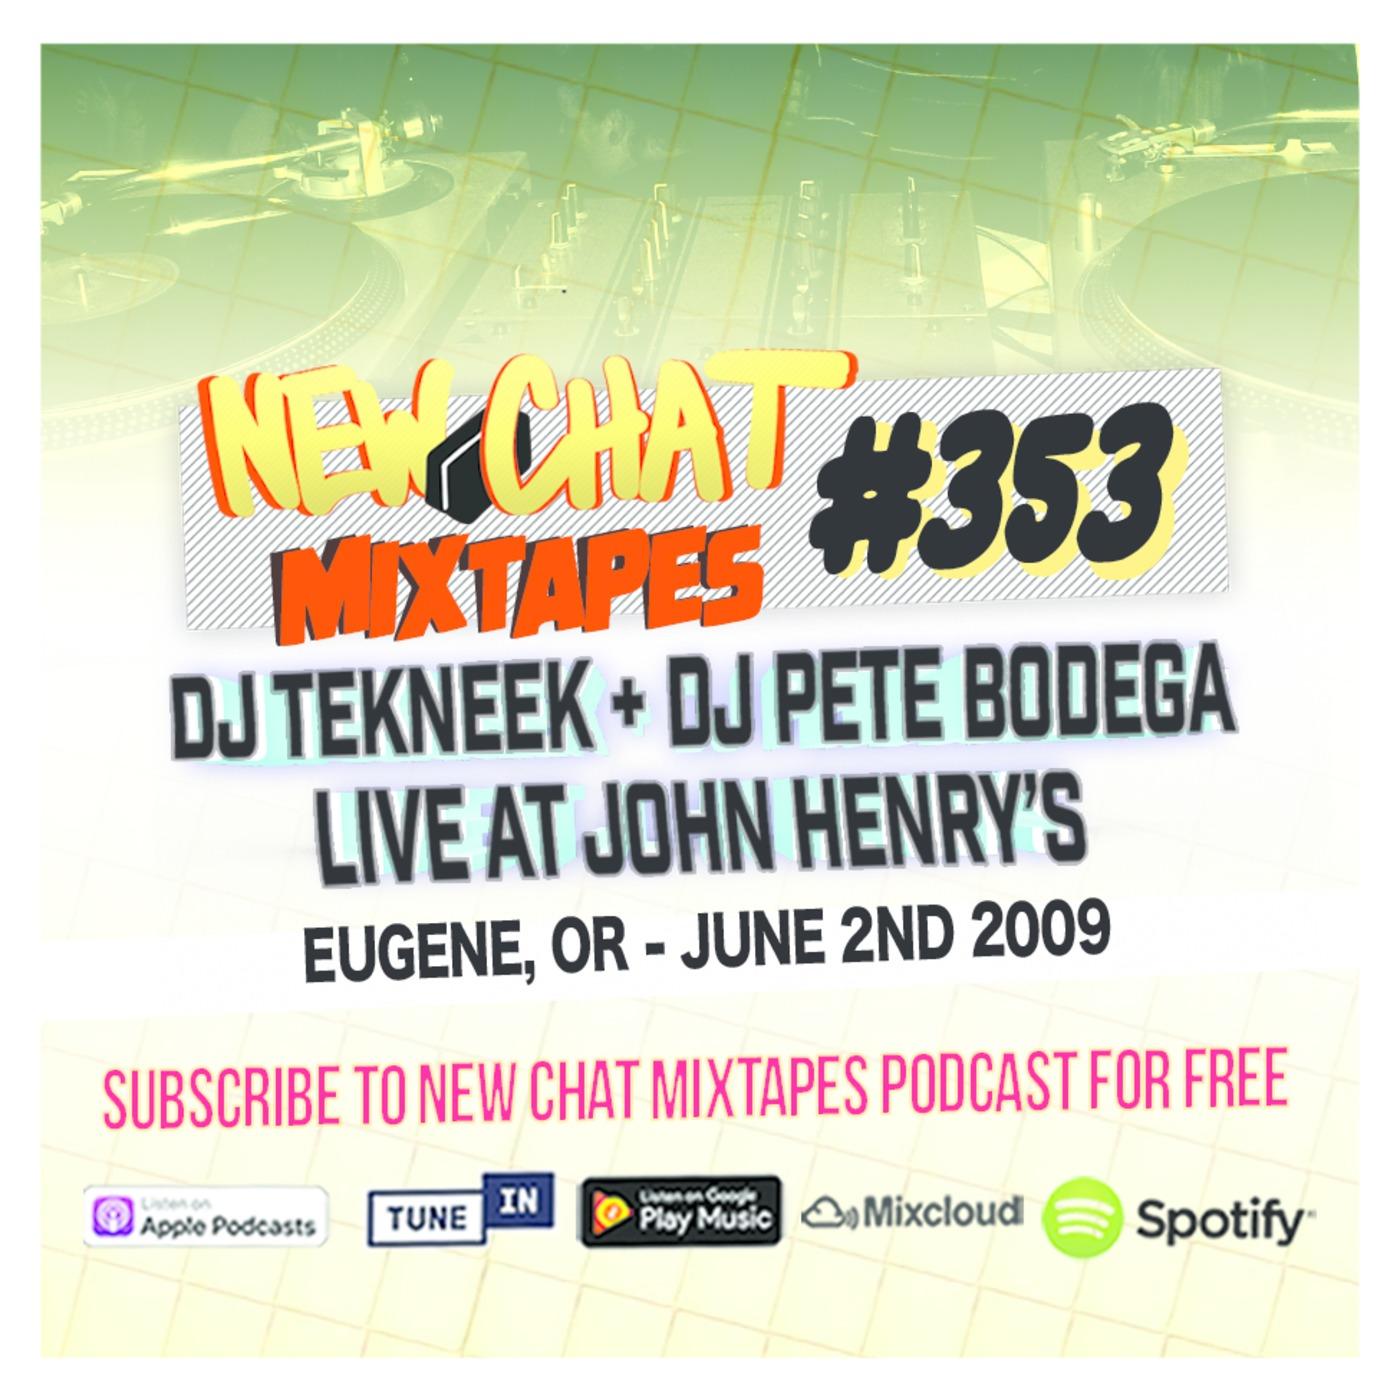 New Chat Mixtapes #353 - DJ TEKNEEK + DJ PETE BODEGA Live At